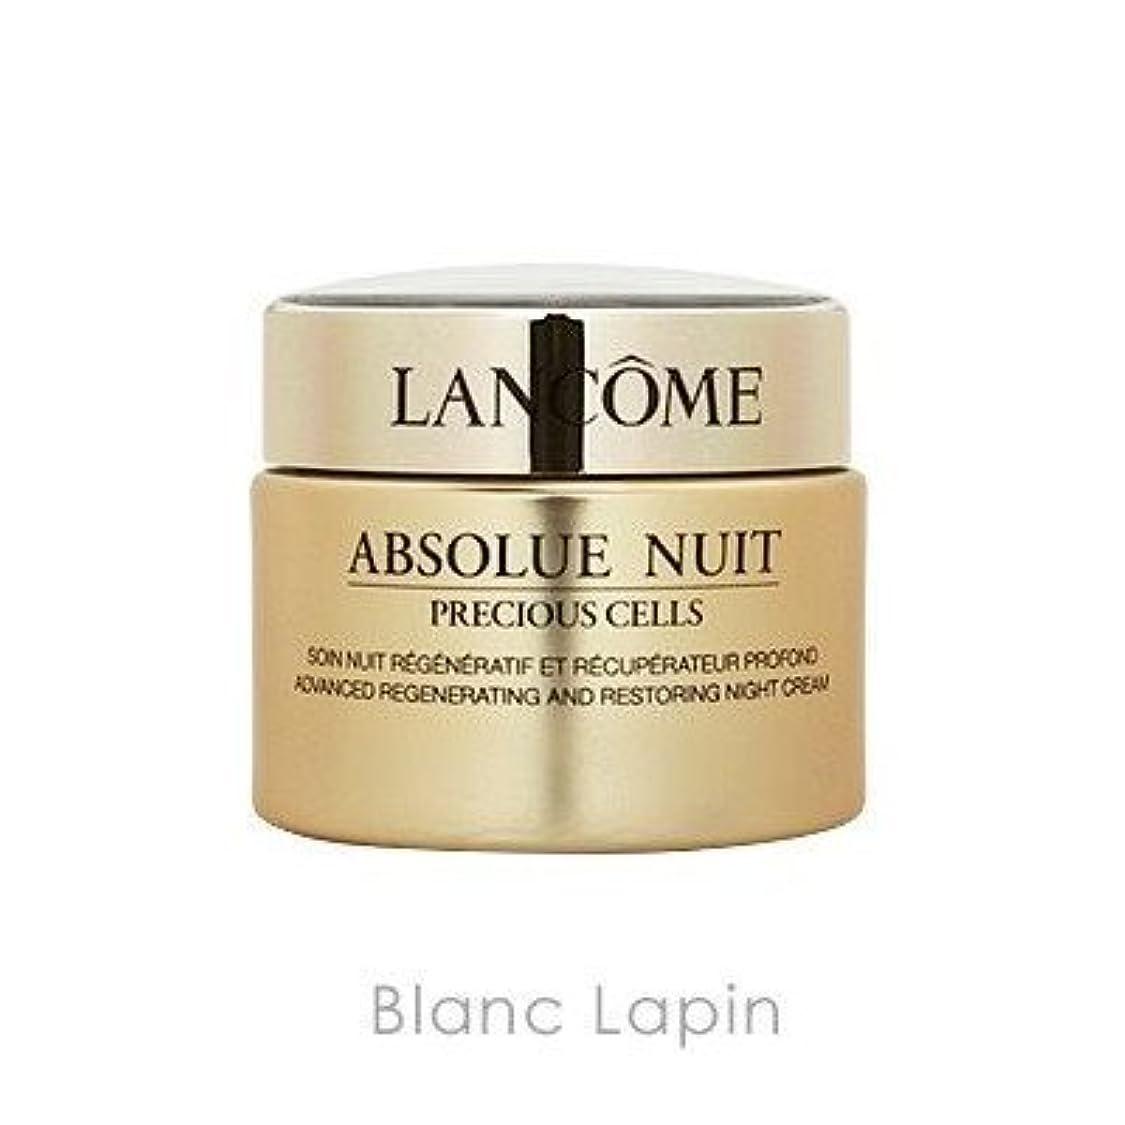 LANCOME アプソリュプレシャスセルナイトトリートメント 50ml [977898] [並行輸入品]